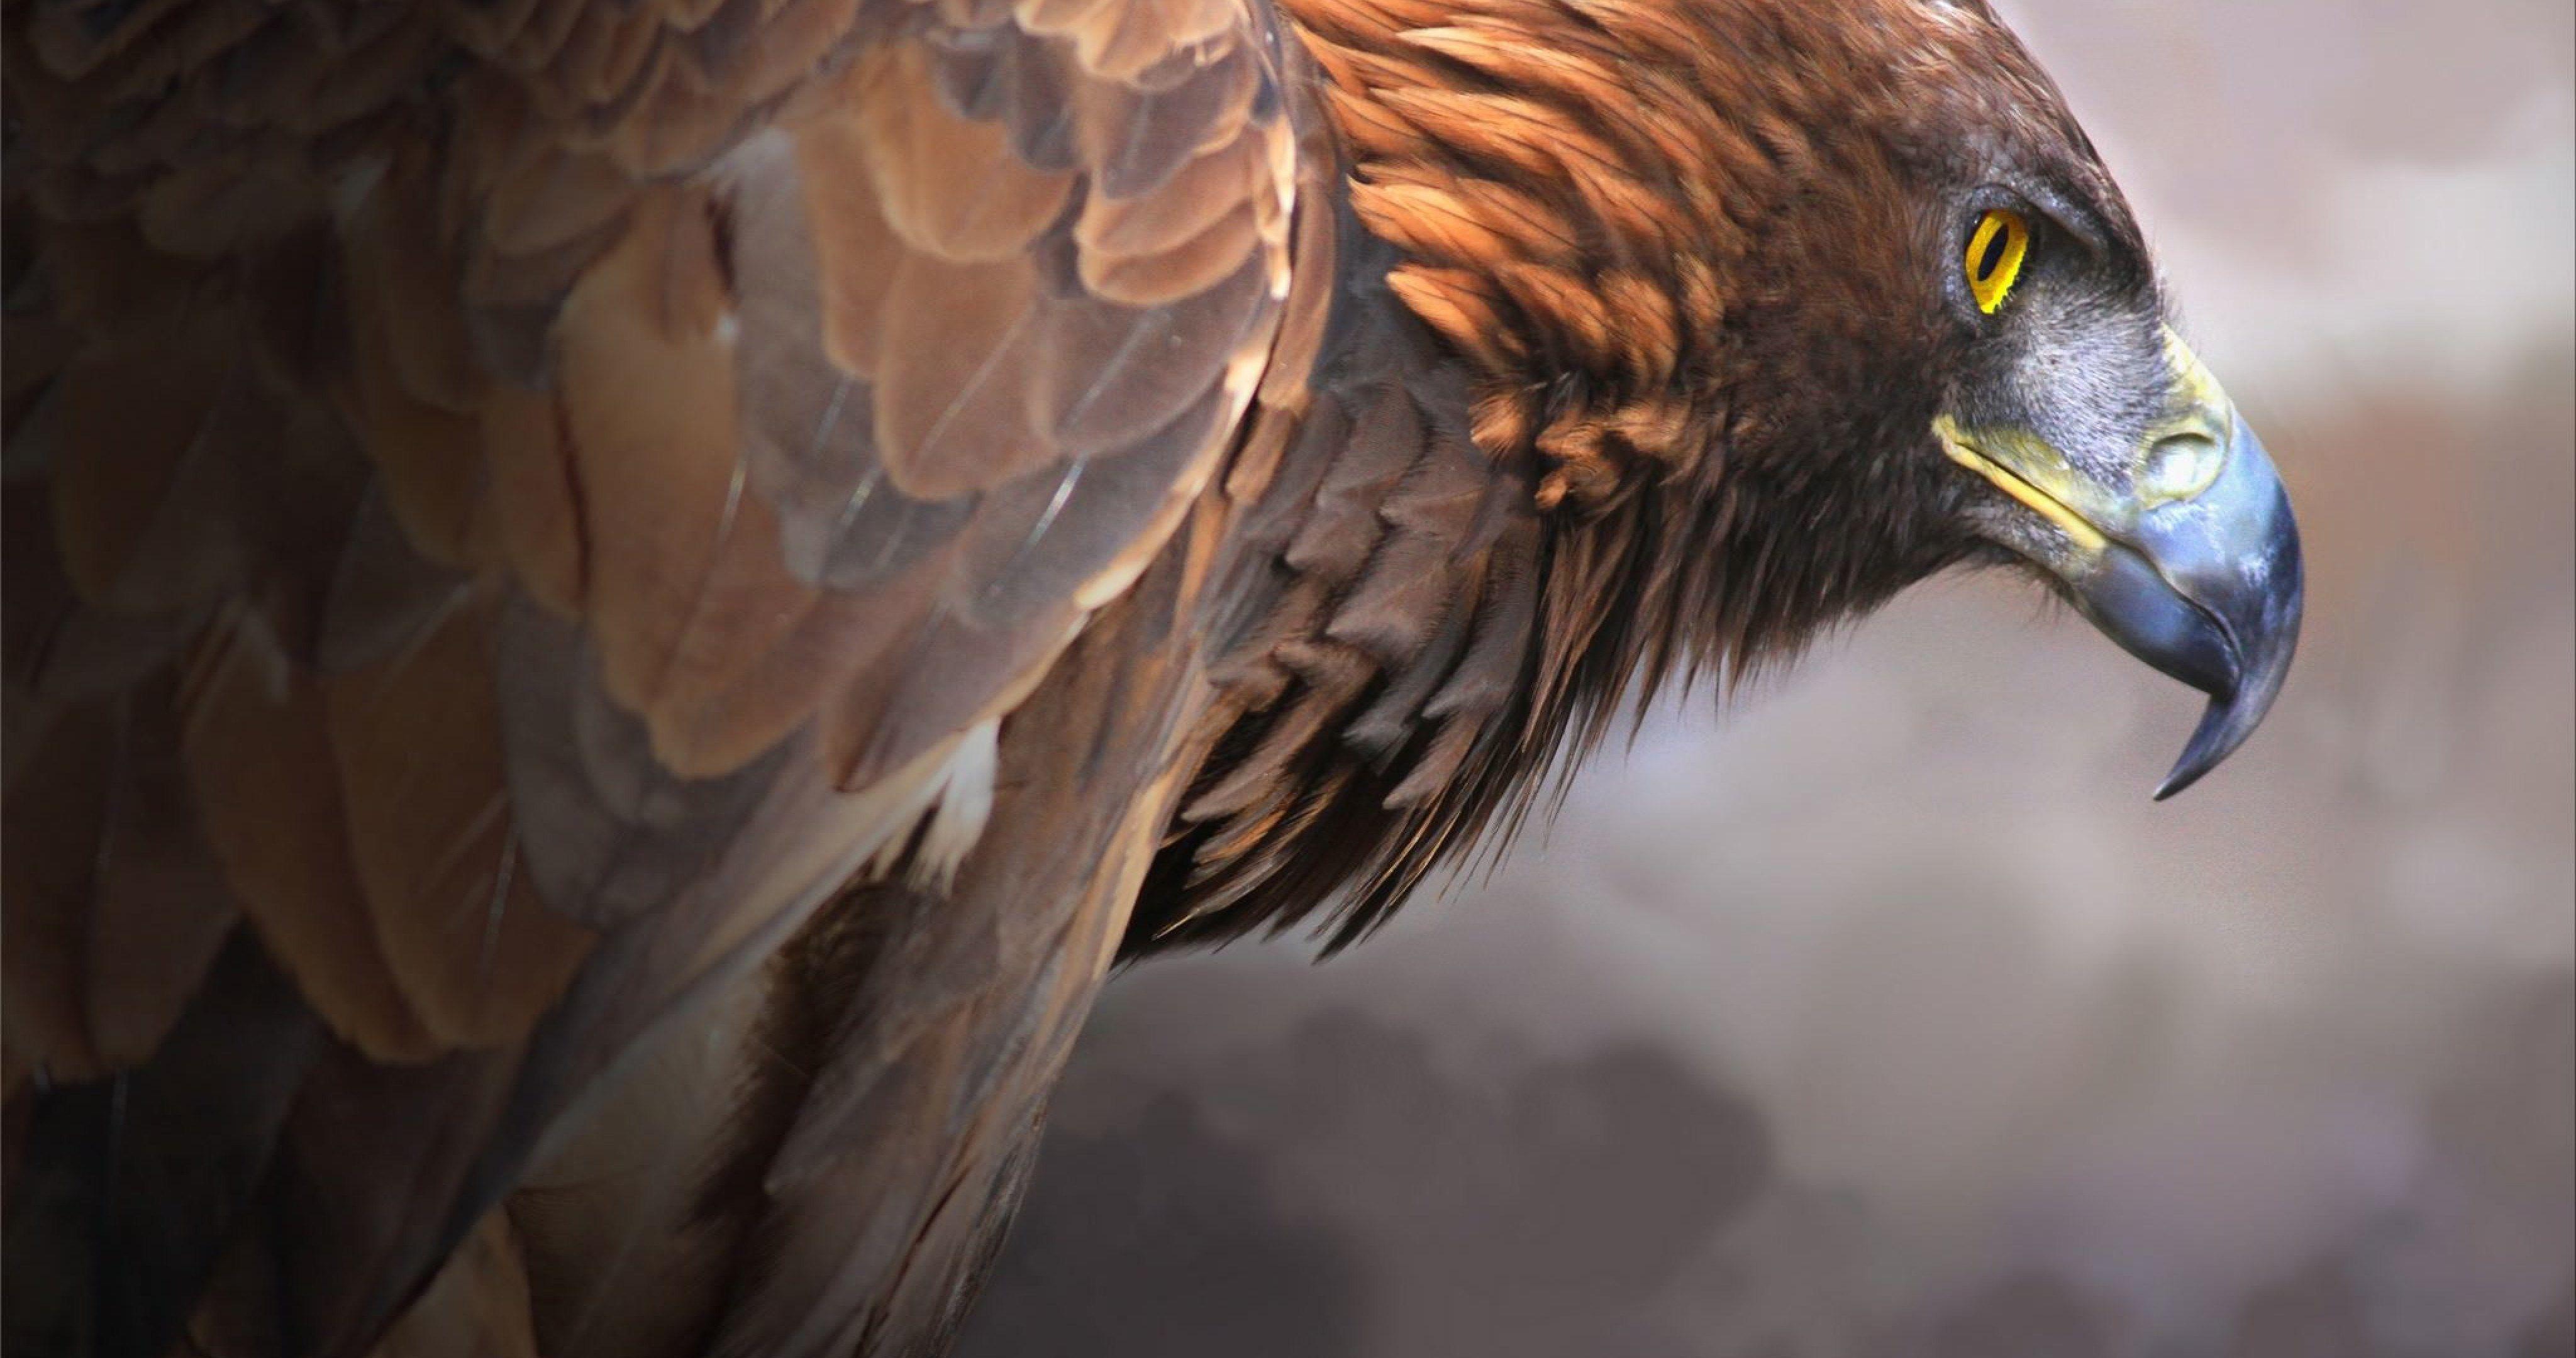 Eagles 4k ultra hd wallpapers top free eagles 4k ultra hd backgrounds wallpaperaccess - 4096x2160 wallpaper ...